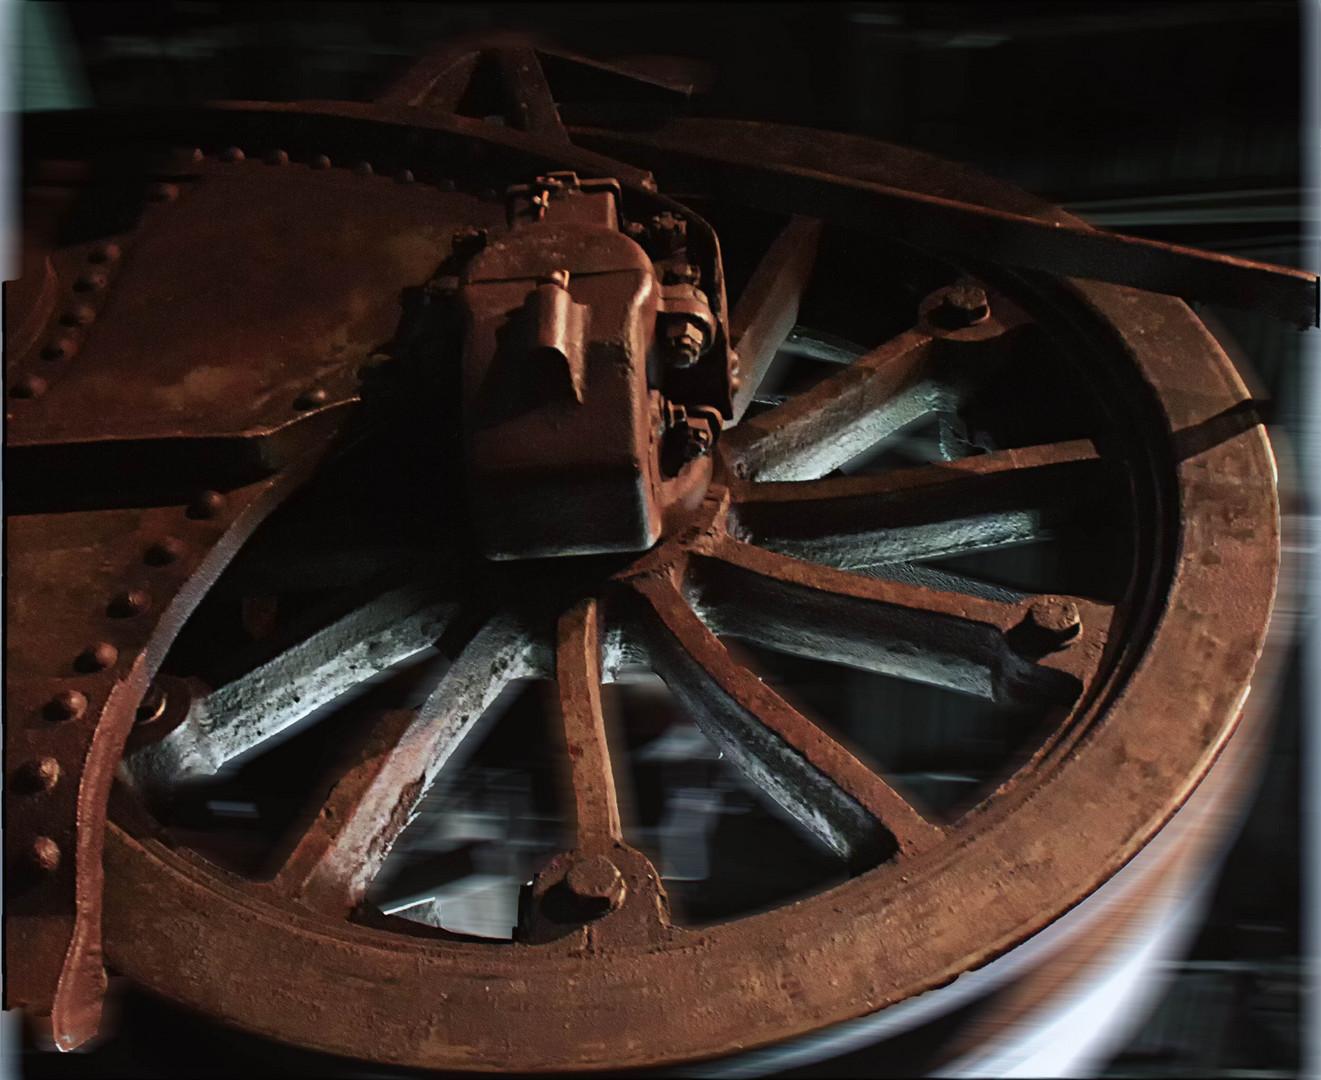 Das alte Rad ...